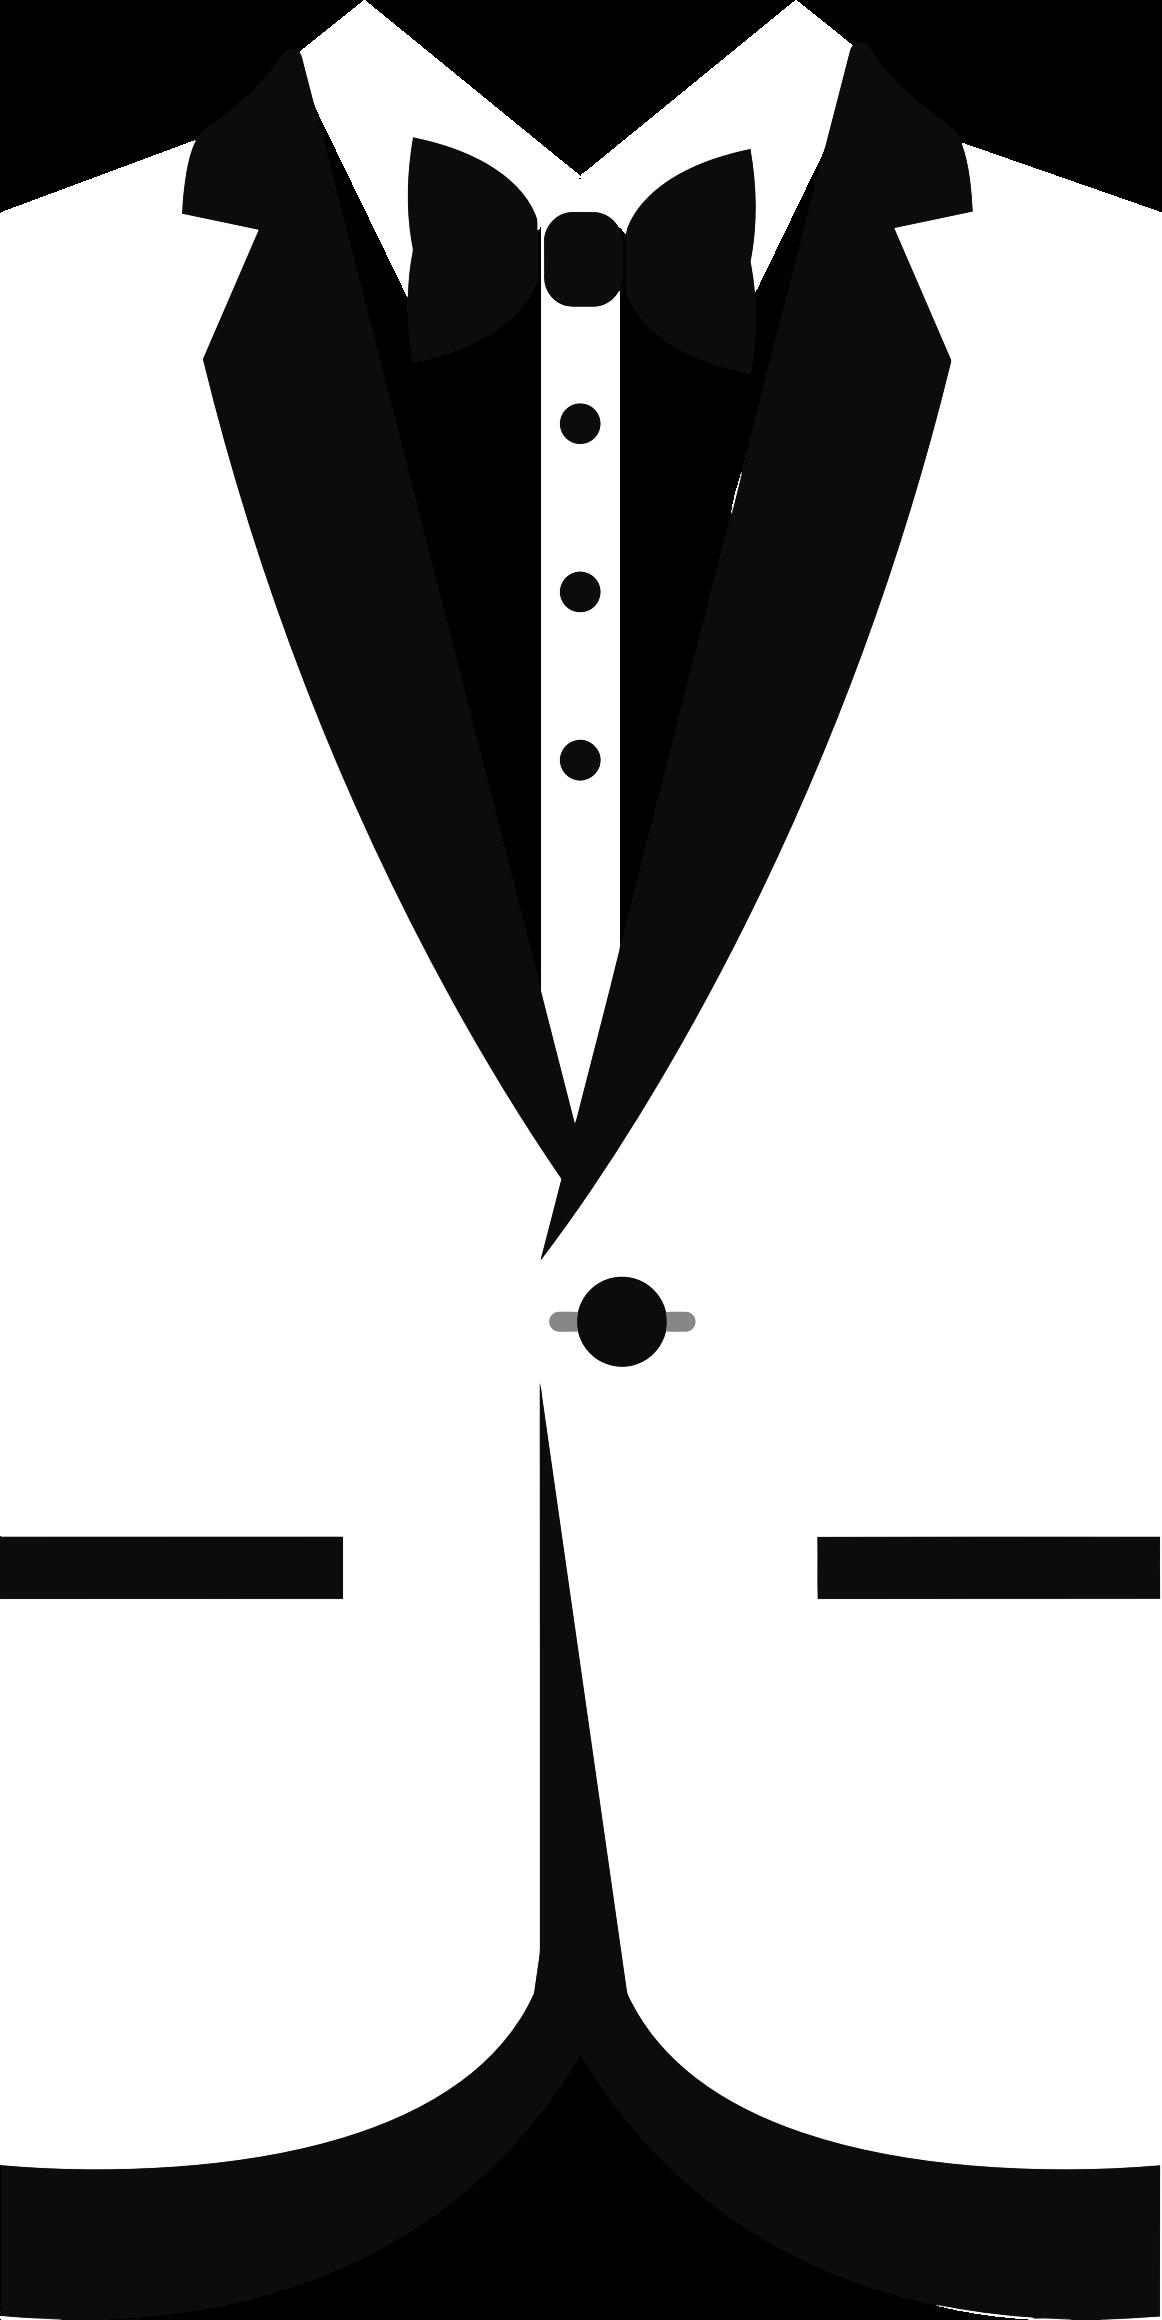 Big image png. Onesie clipart tuxedo